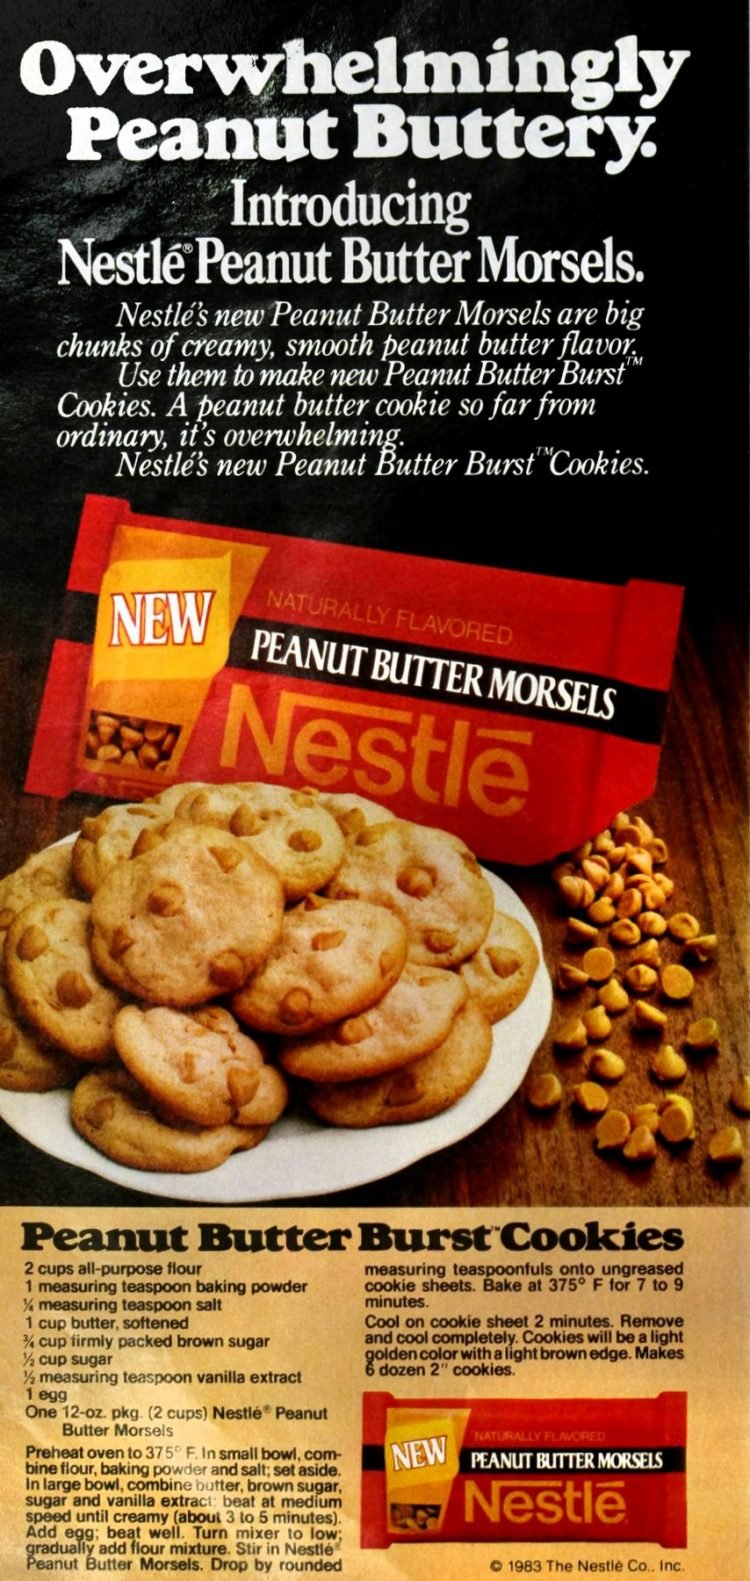 Peanut butter burst cookies